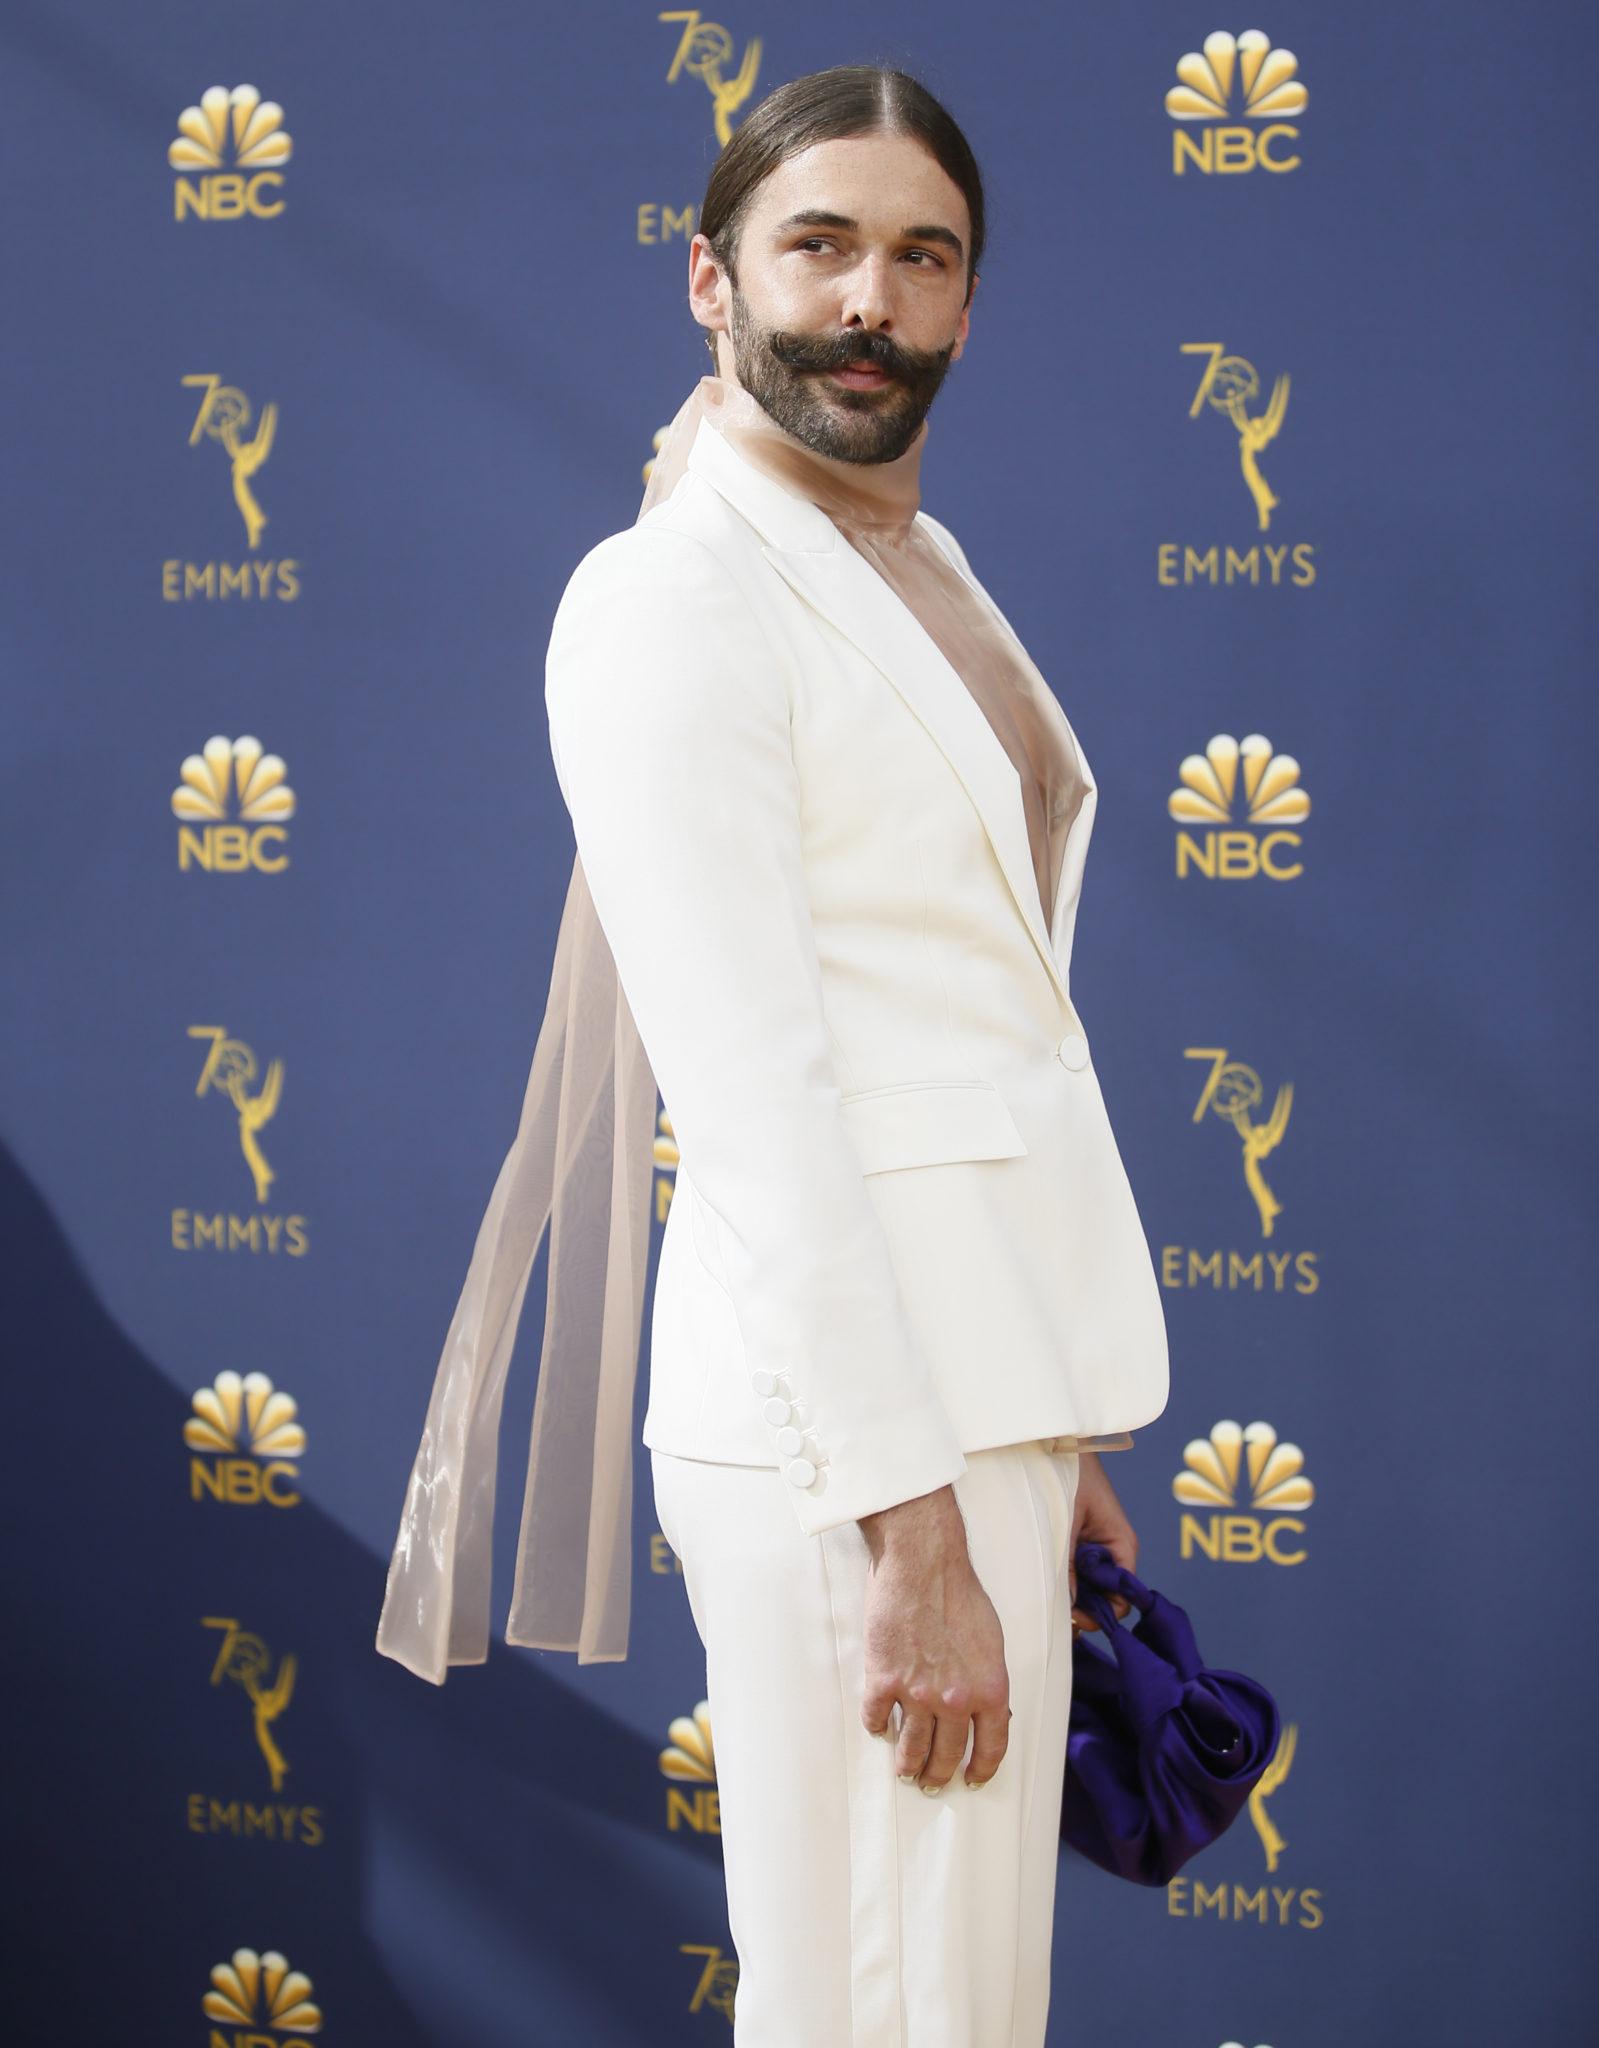 Jonathan Van Ness Emmys 4Chion Lifestyle